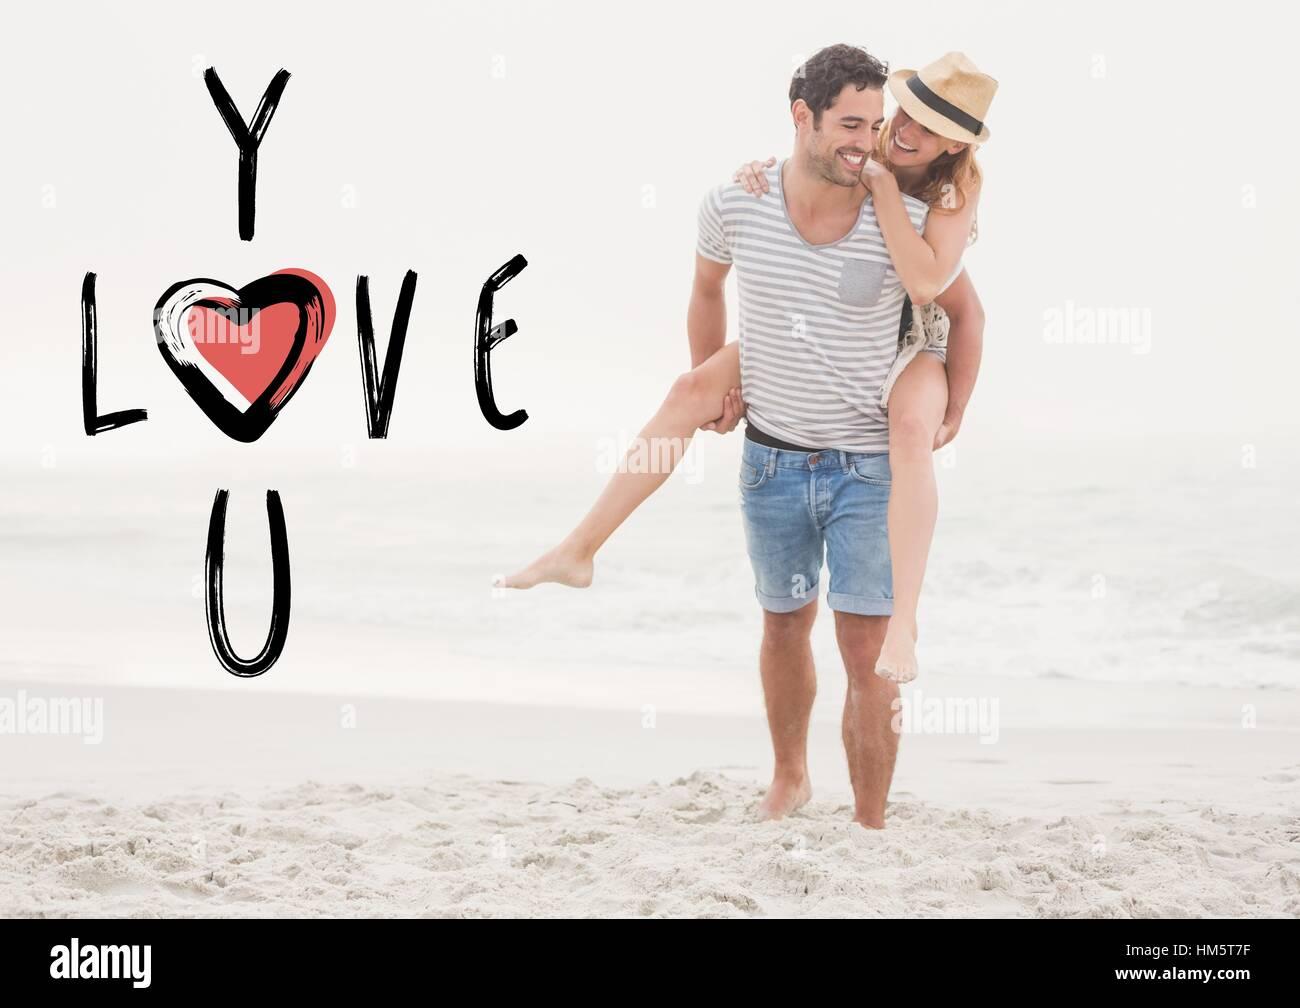 Happy man giving woman piggyback on beach - Stock Image